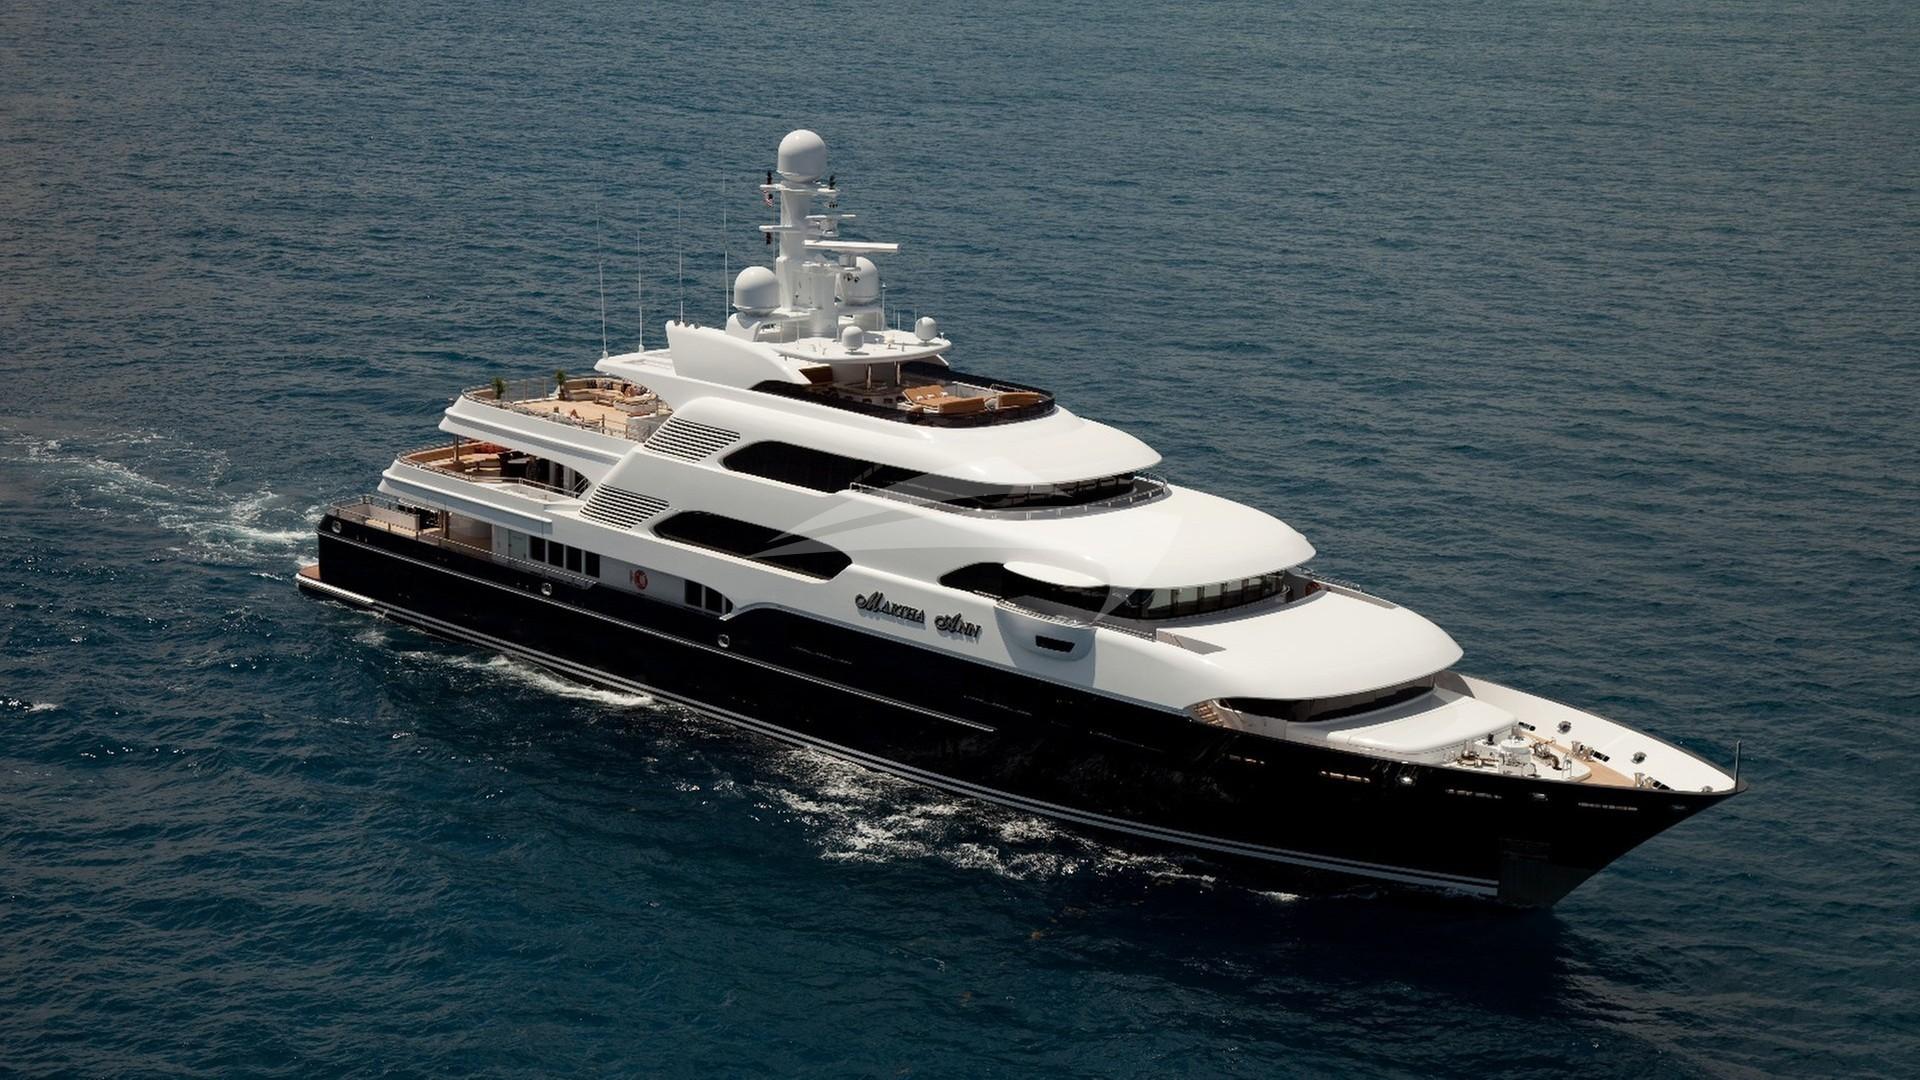 Luxury charter yacht martha ann lurssen power yacht 2008 for Lurssen yacht genova